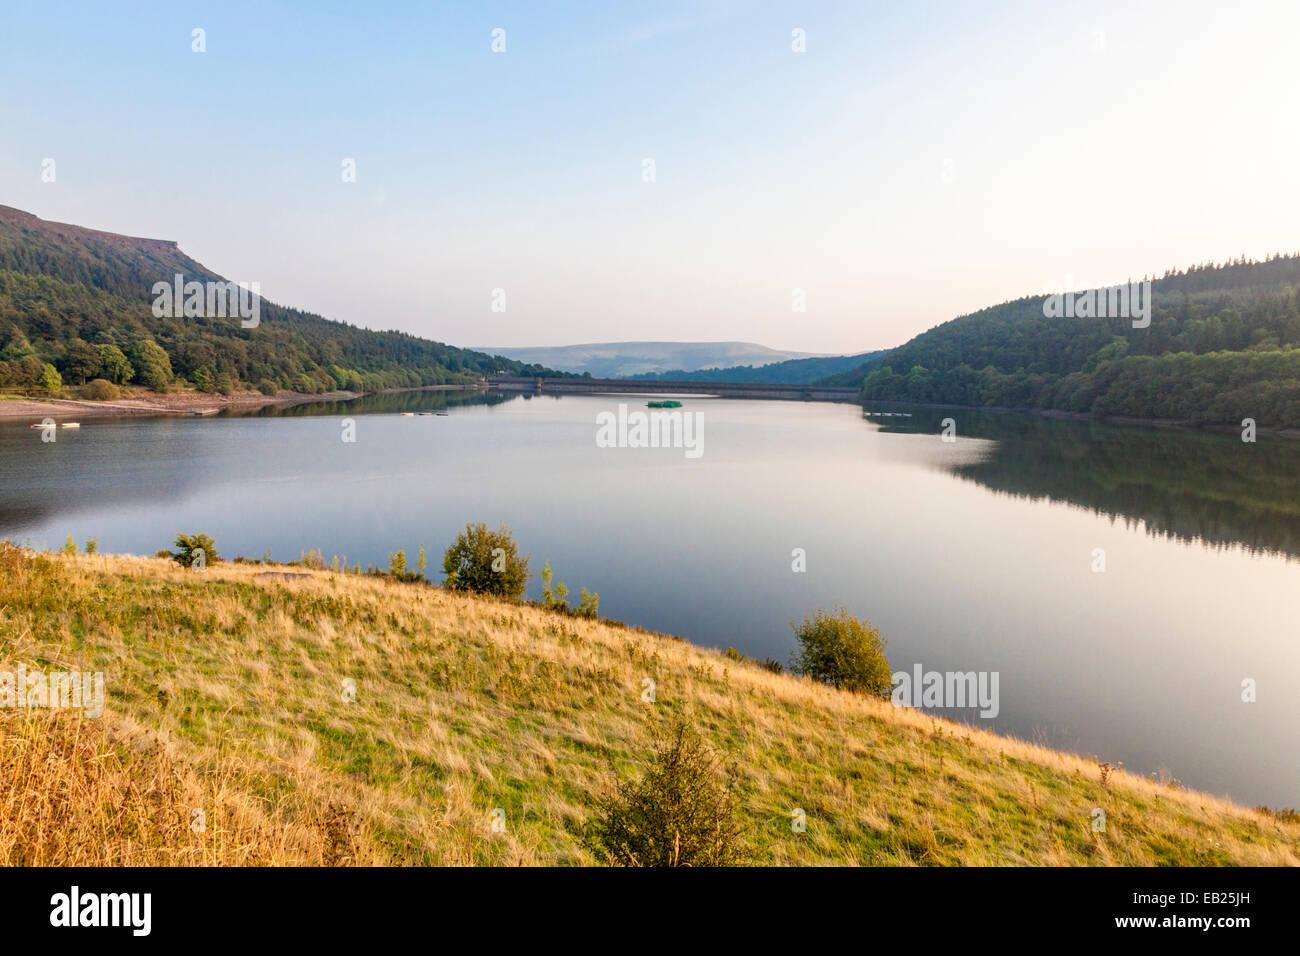 Looking south across Ladybower Reservoir towards the dam, Derbyshire, Peak District National Park, England, UK - Stock Image